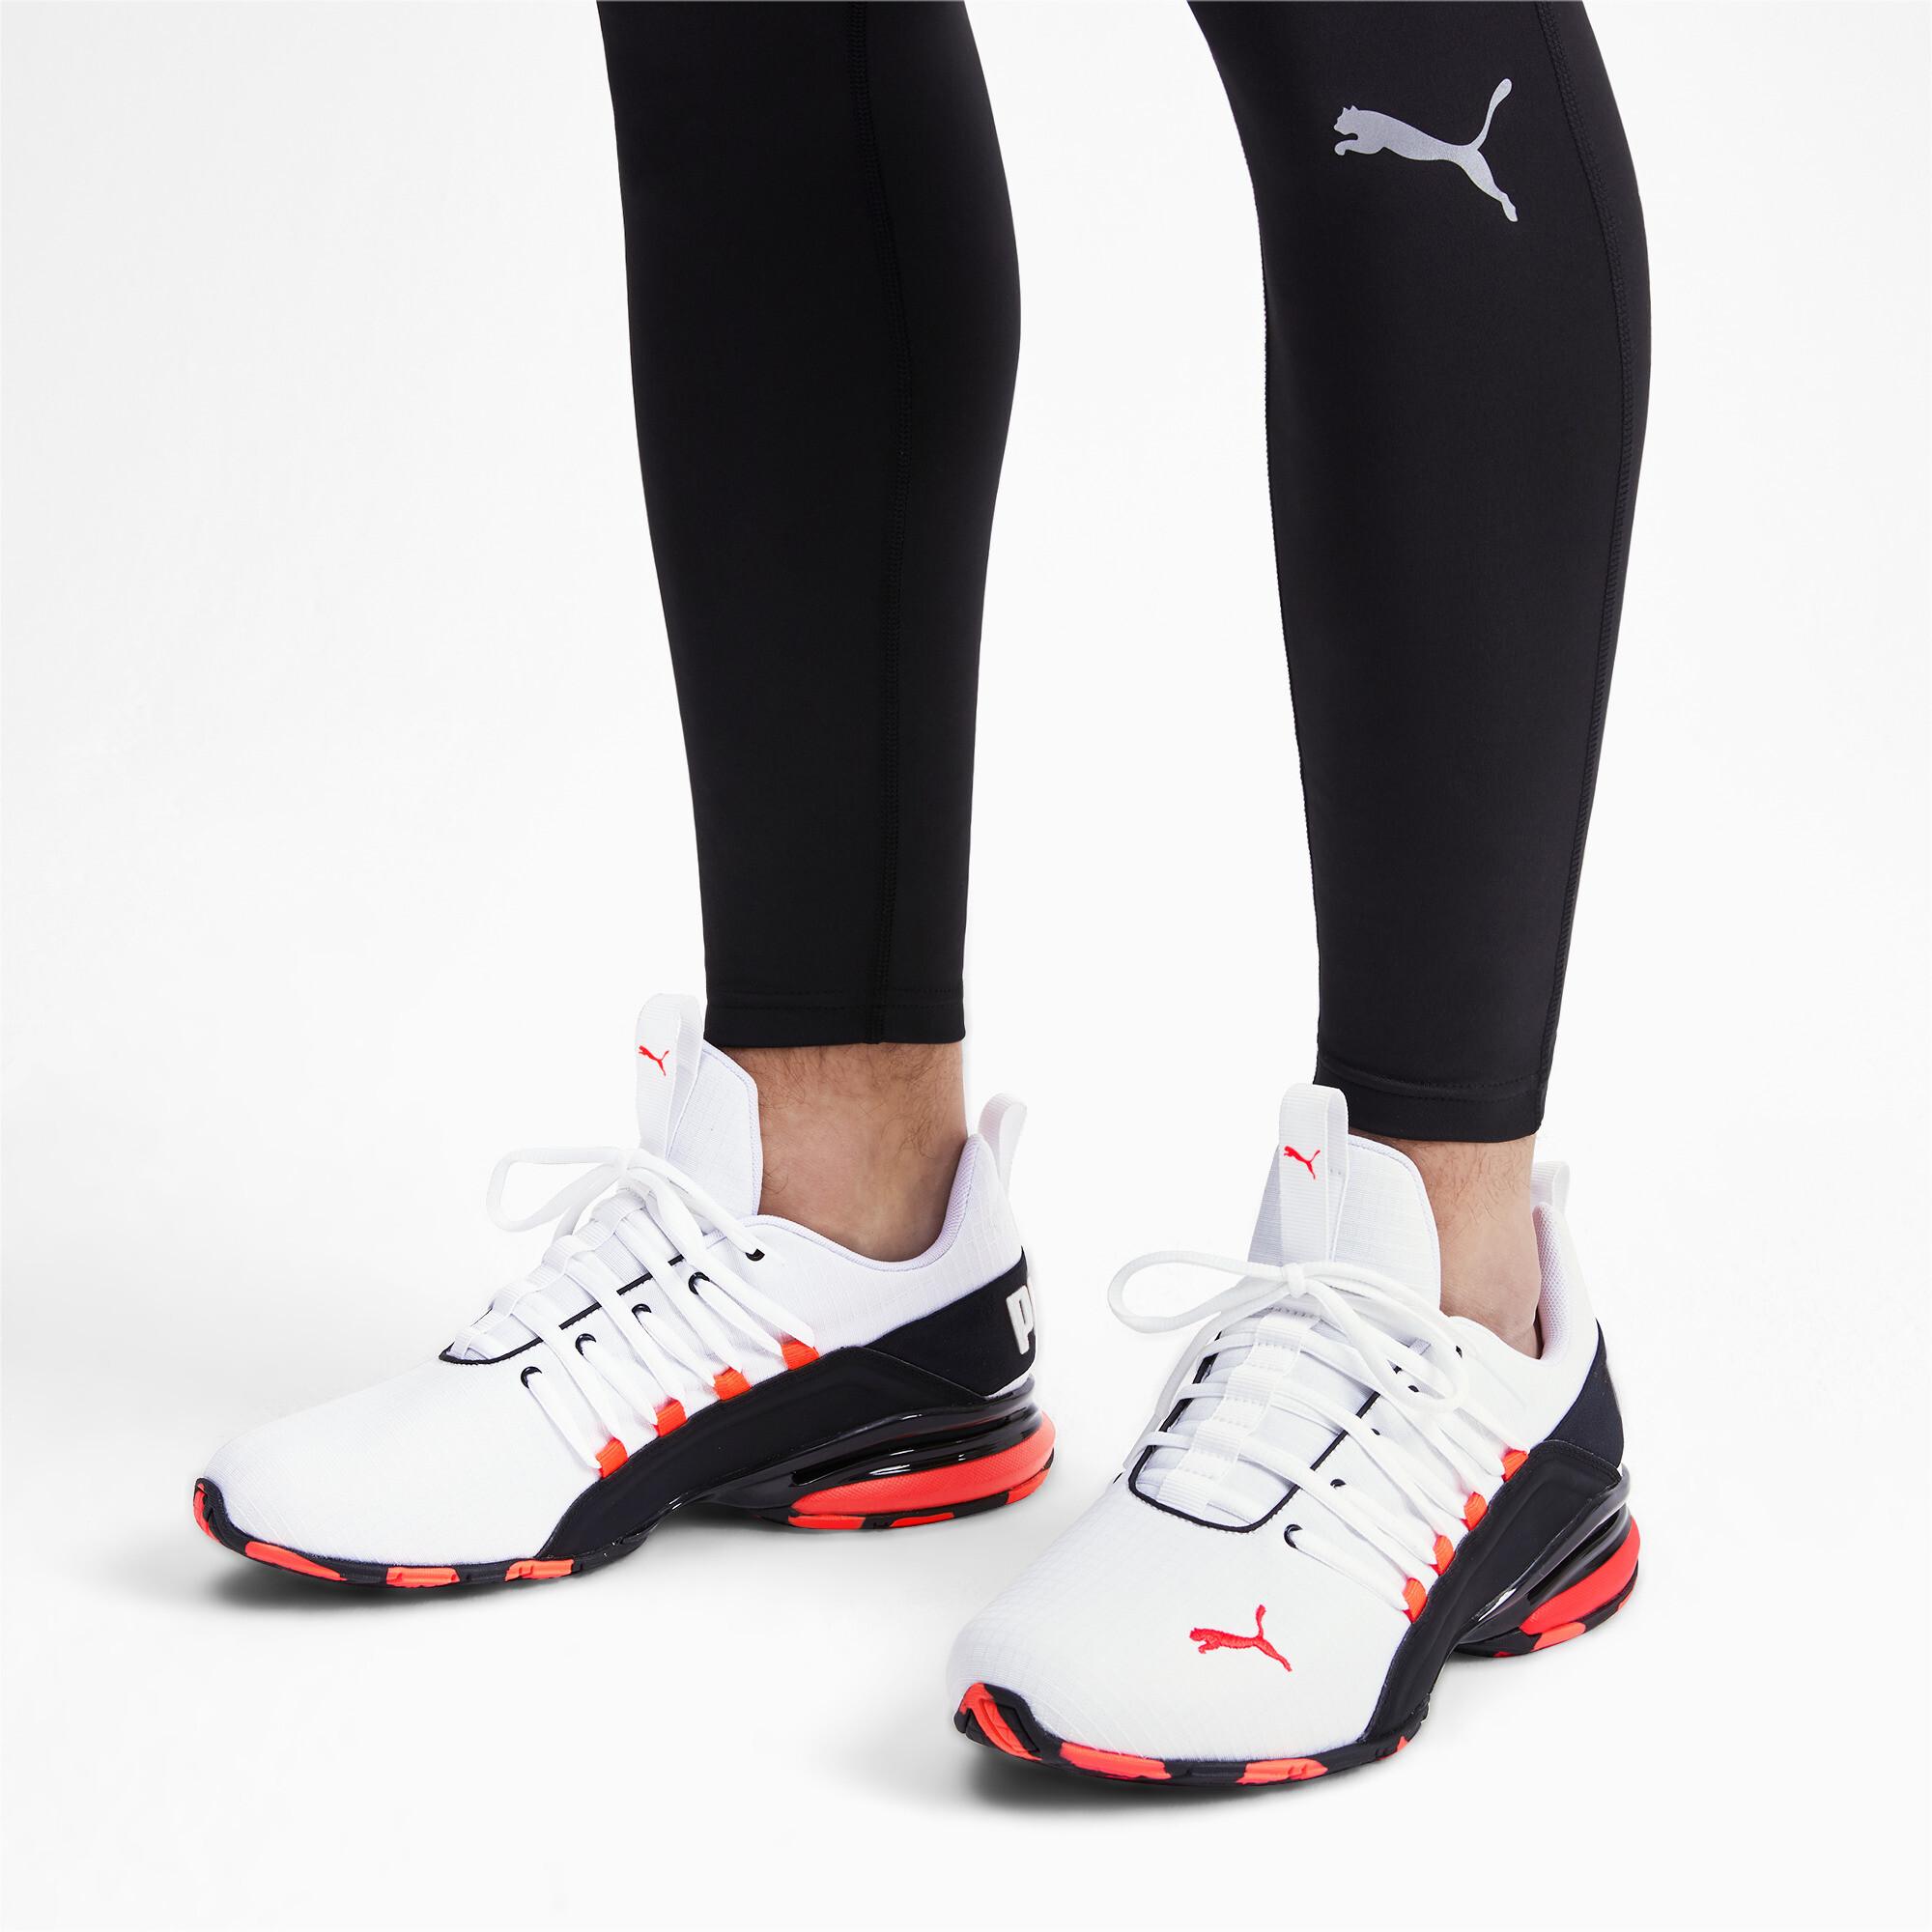 PUMA-Men-039-s-Axelion-Rip-Training-Shoes thumbnail 5